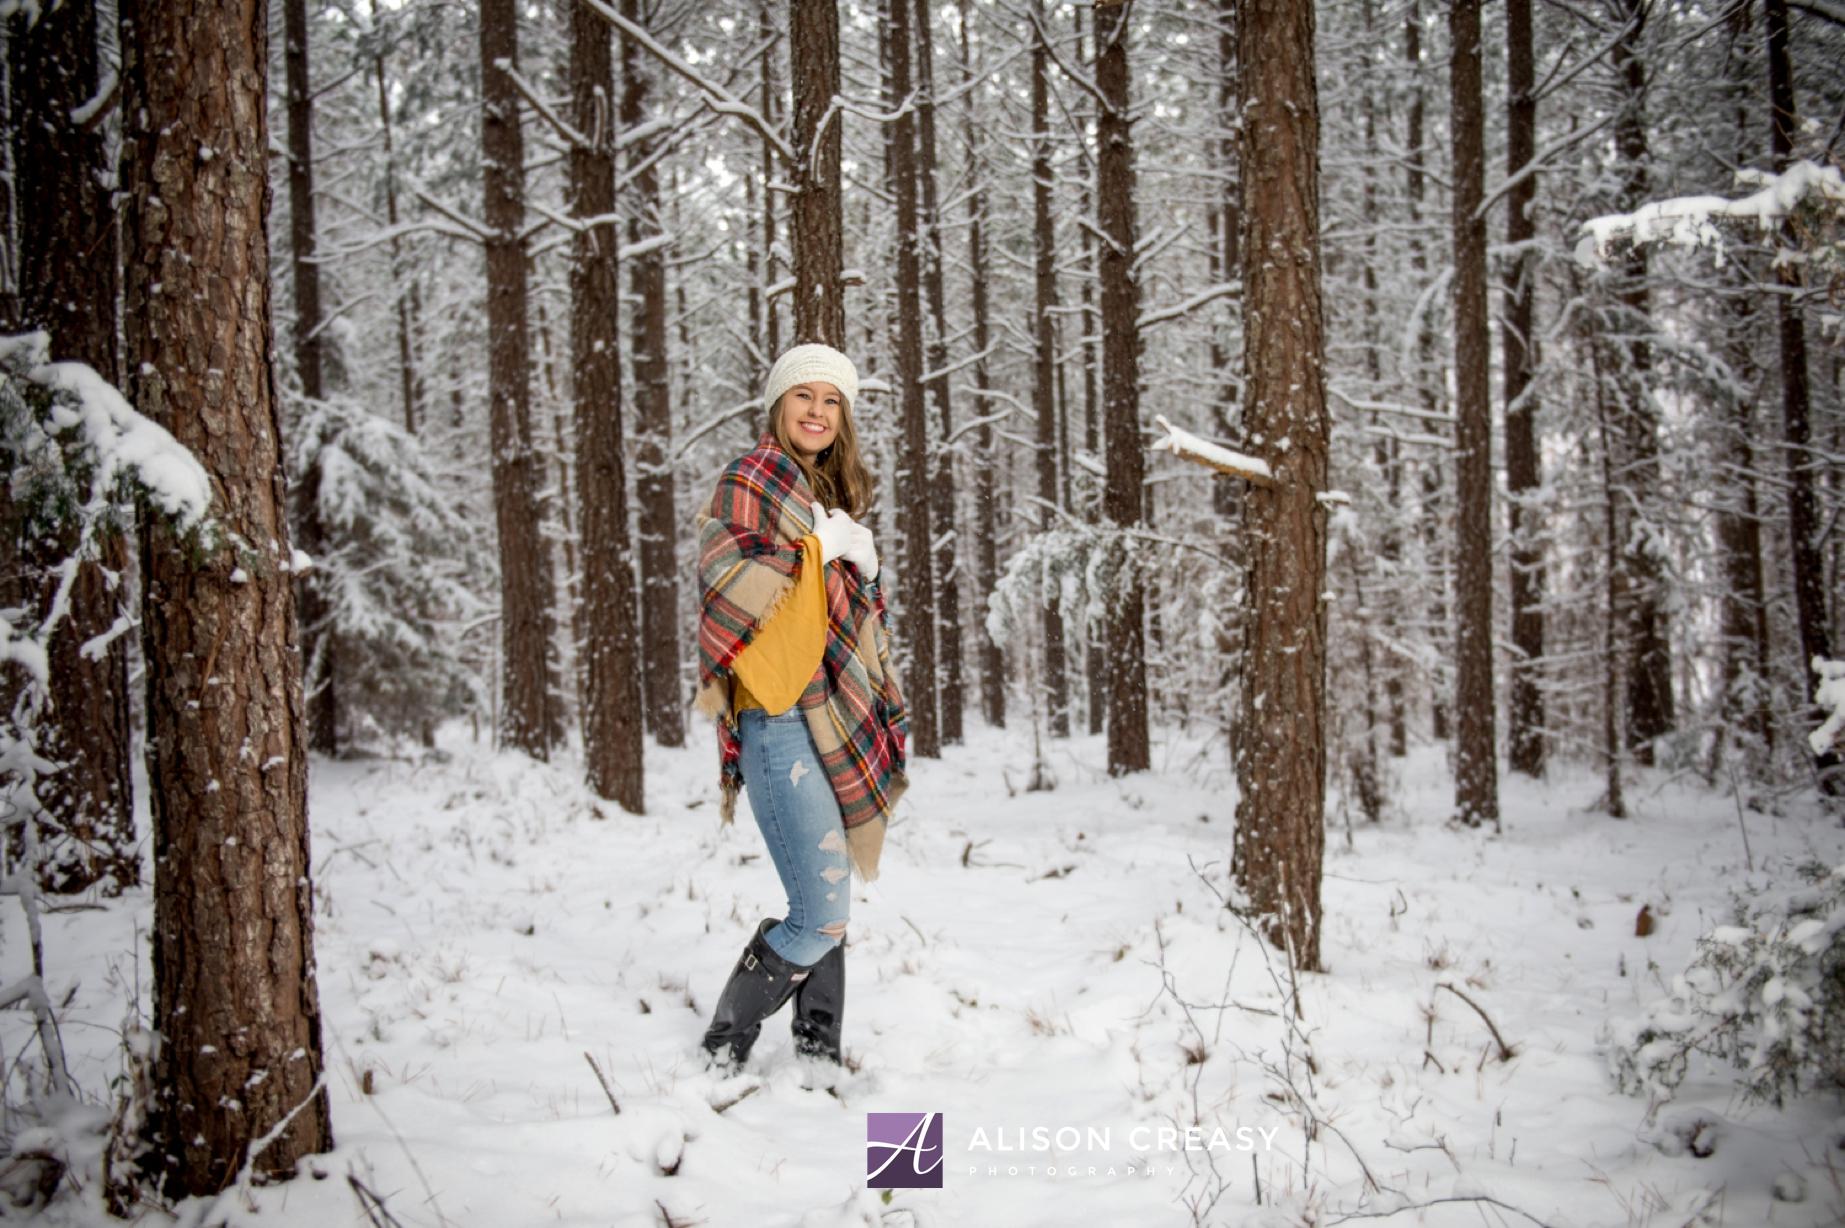 Alison-Creasy-Photography-Lynchburg-VA-Senior-Photographer_0026.jpg